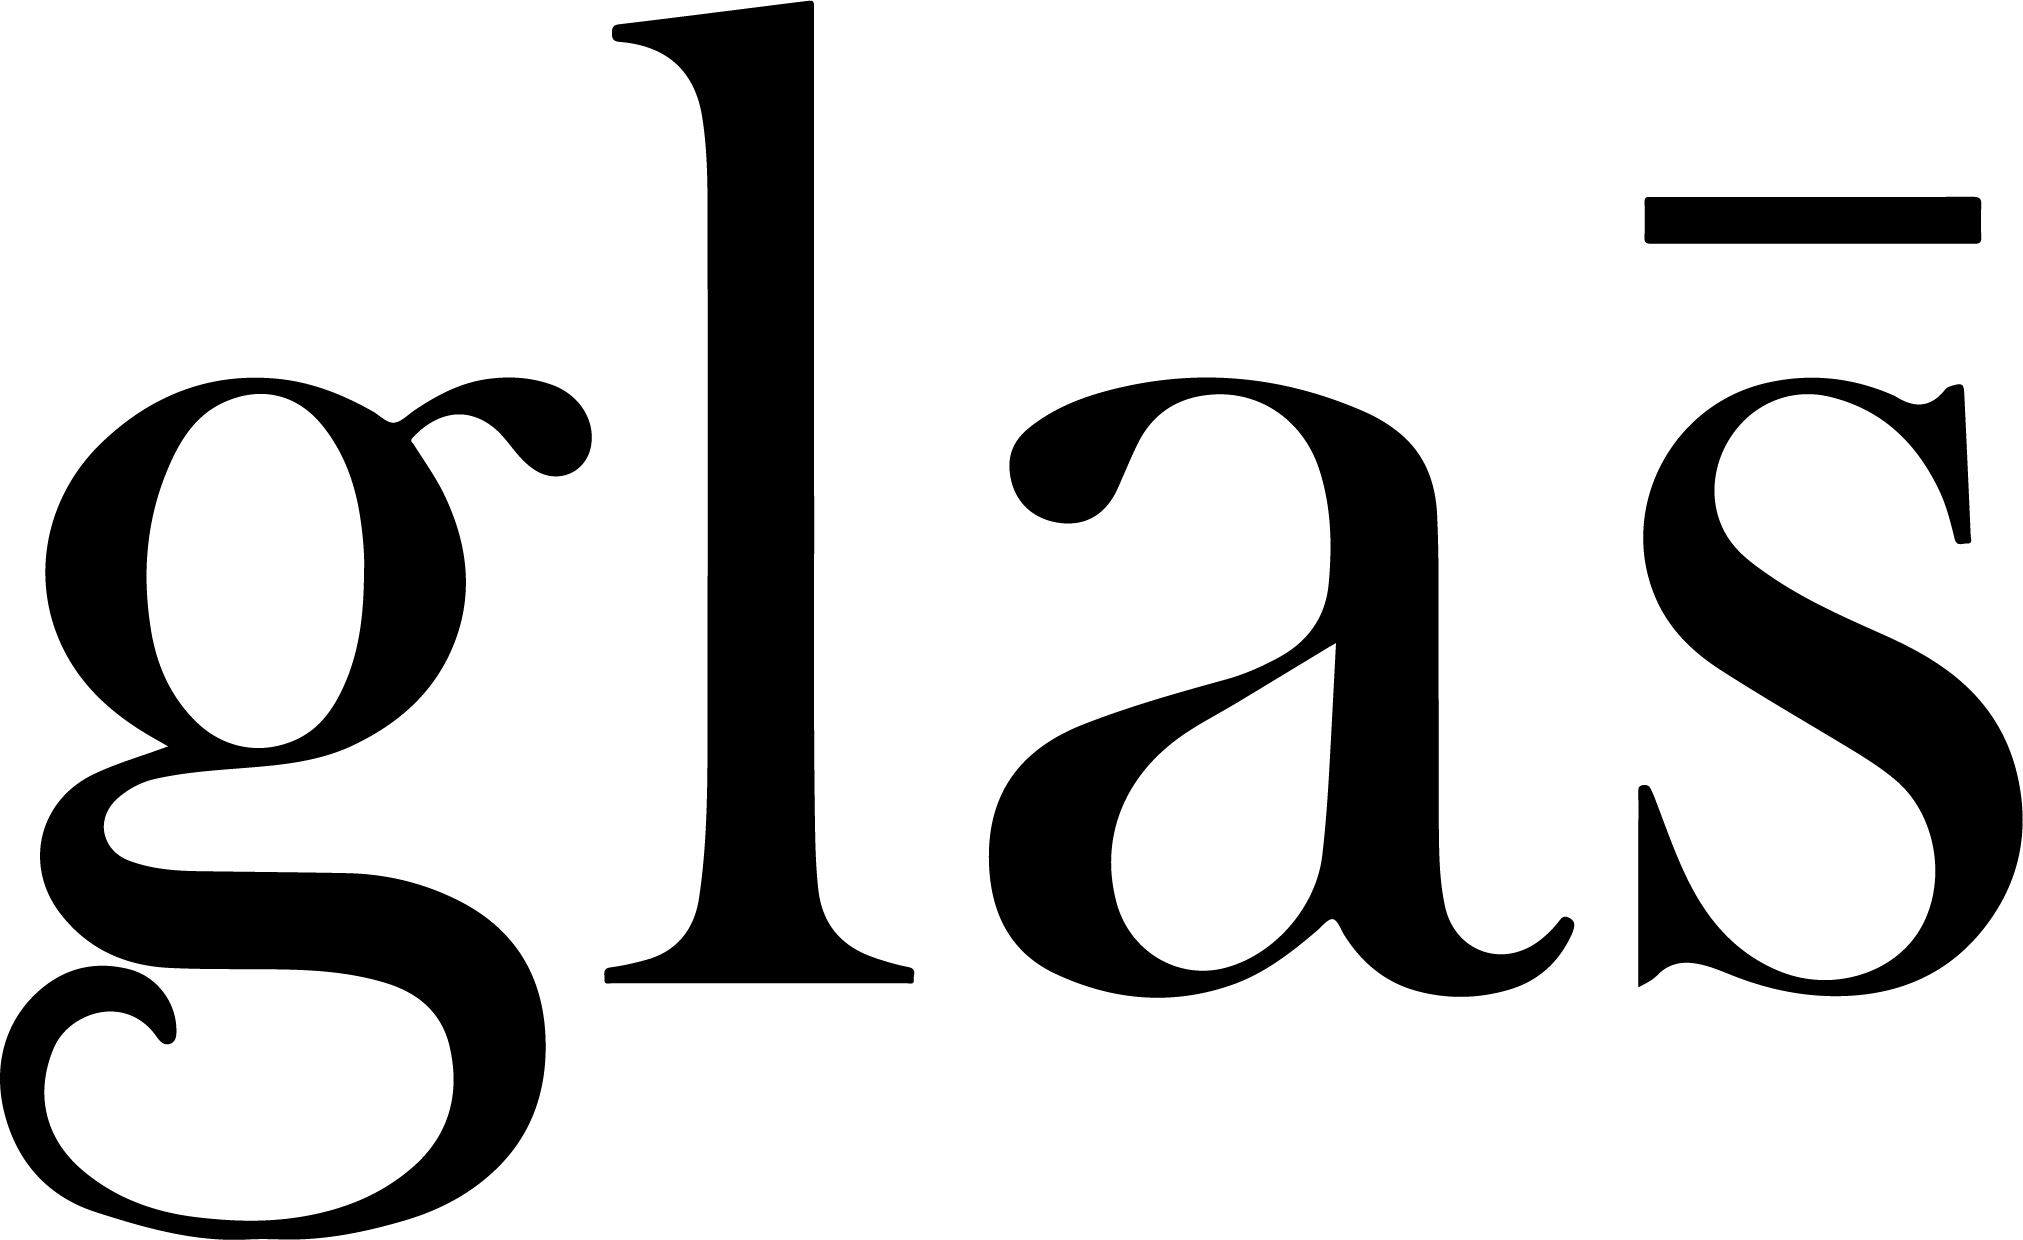 cf87930a-b9e9-429b-aebc-9360dd81696c.png